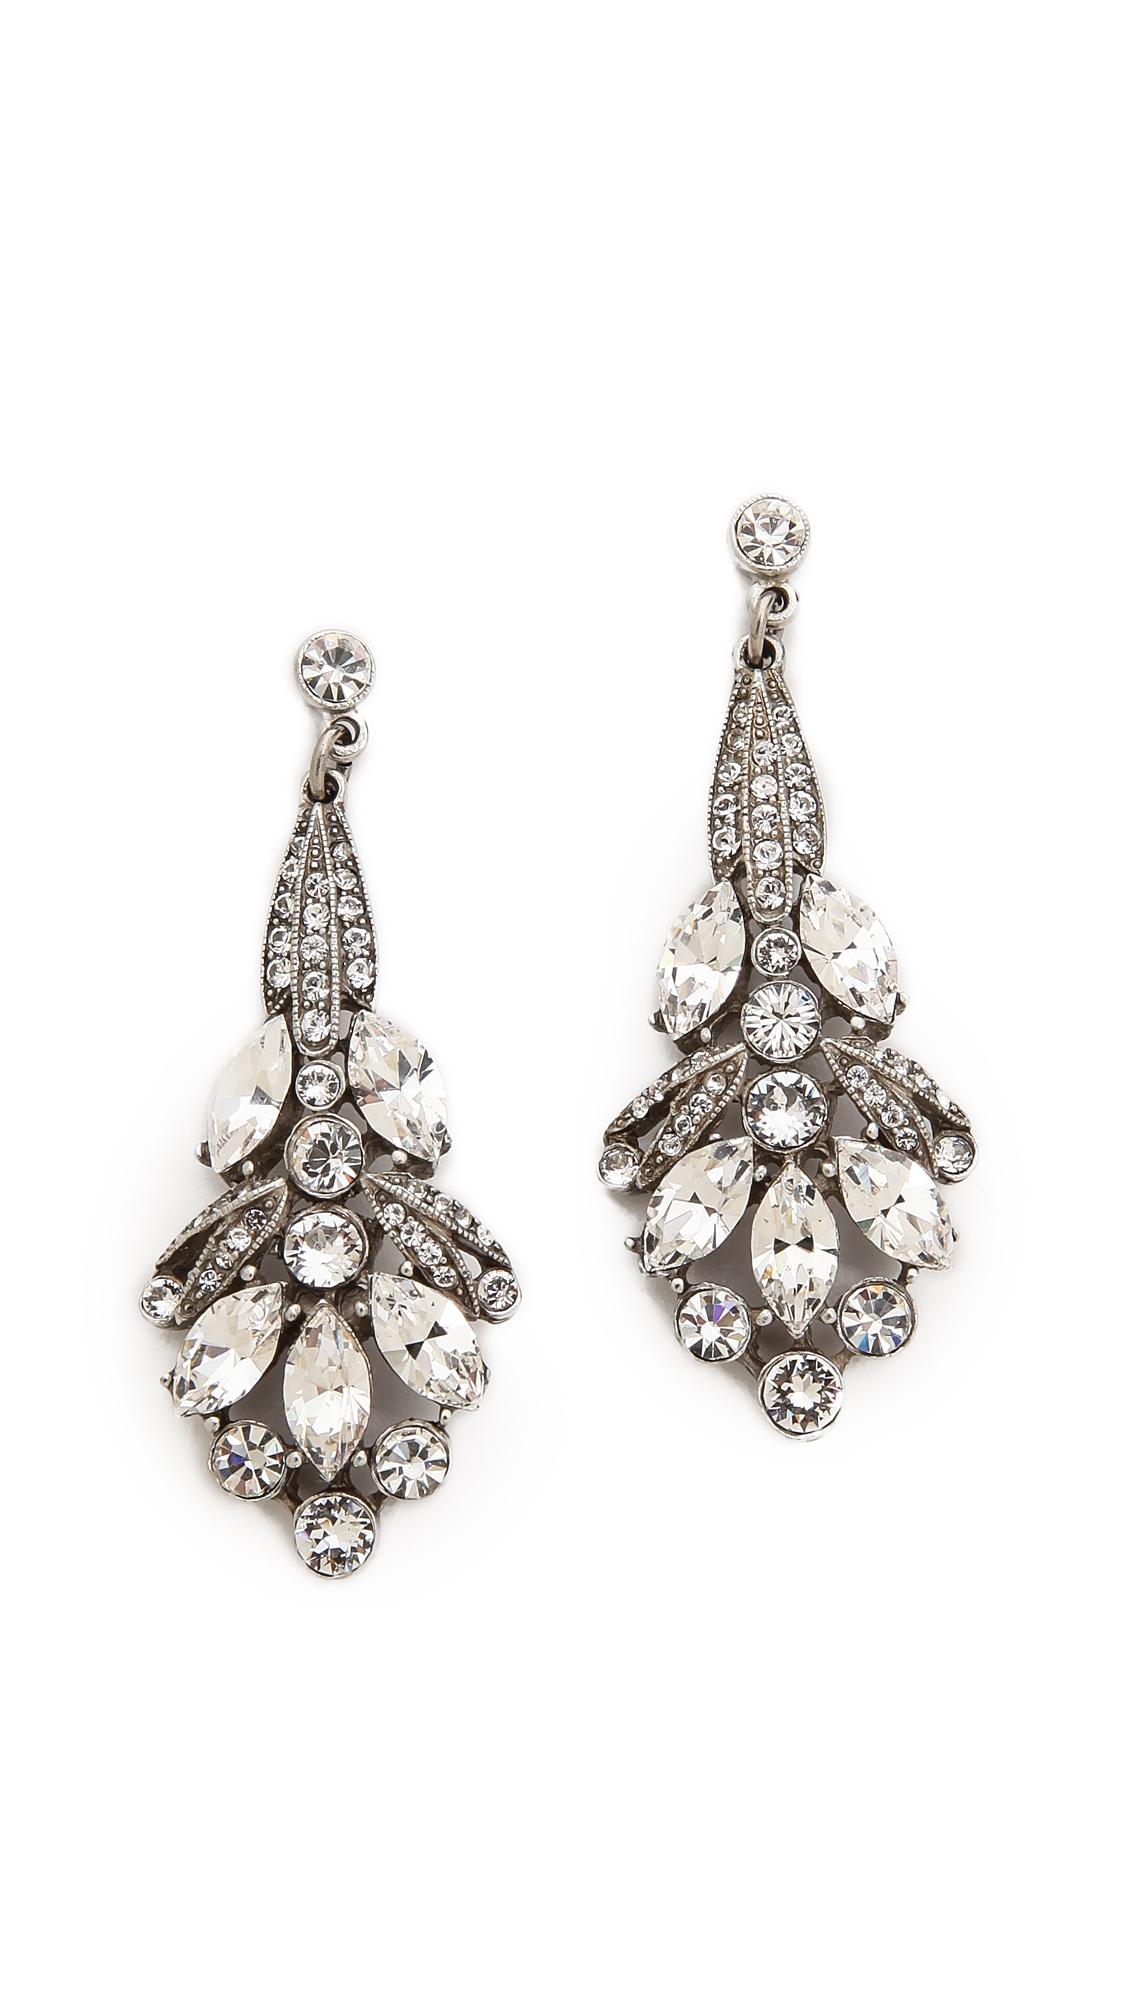 Amun crystal drop earrings